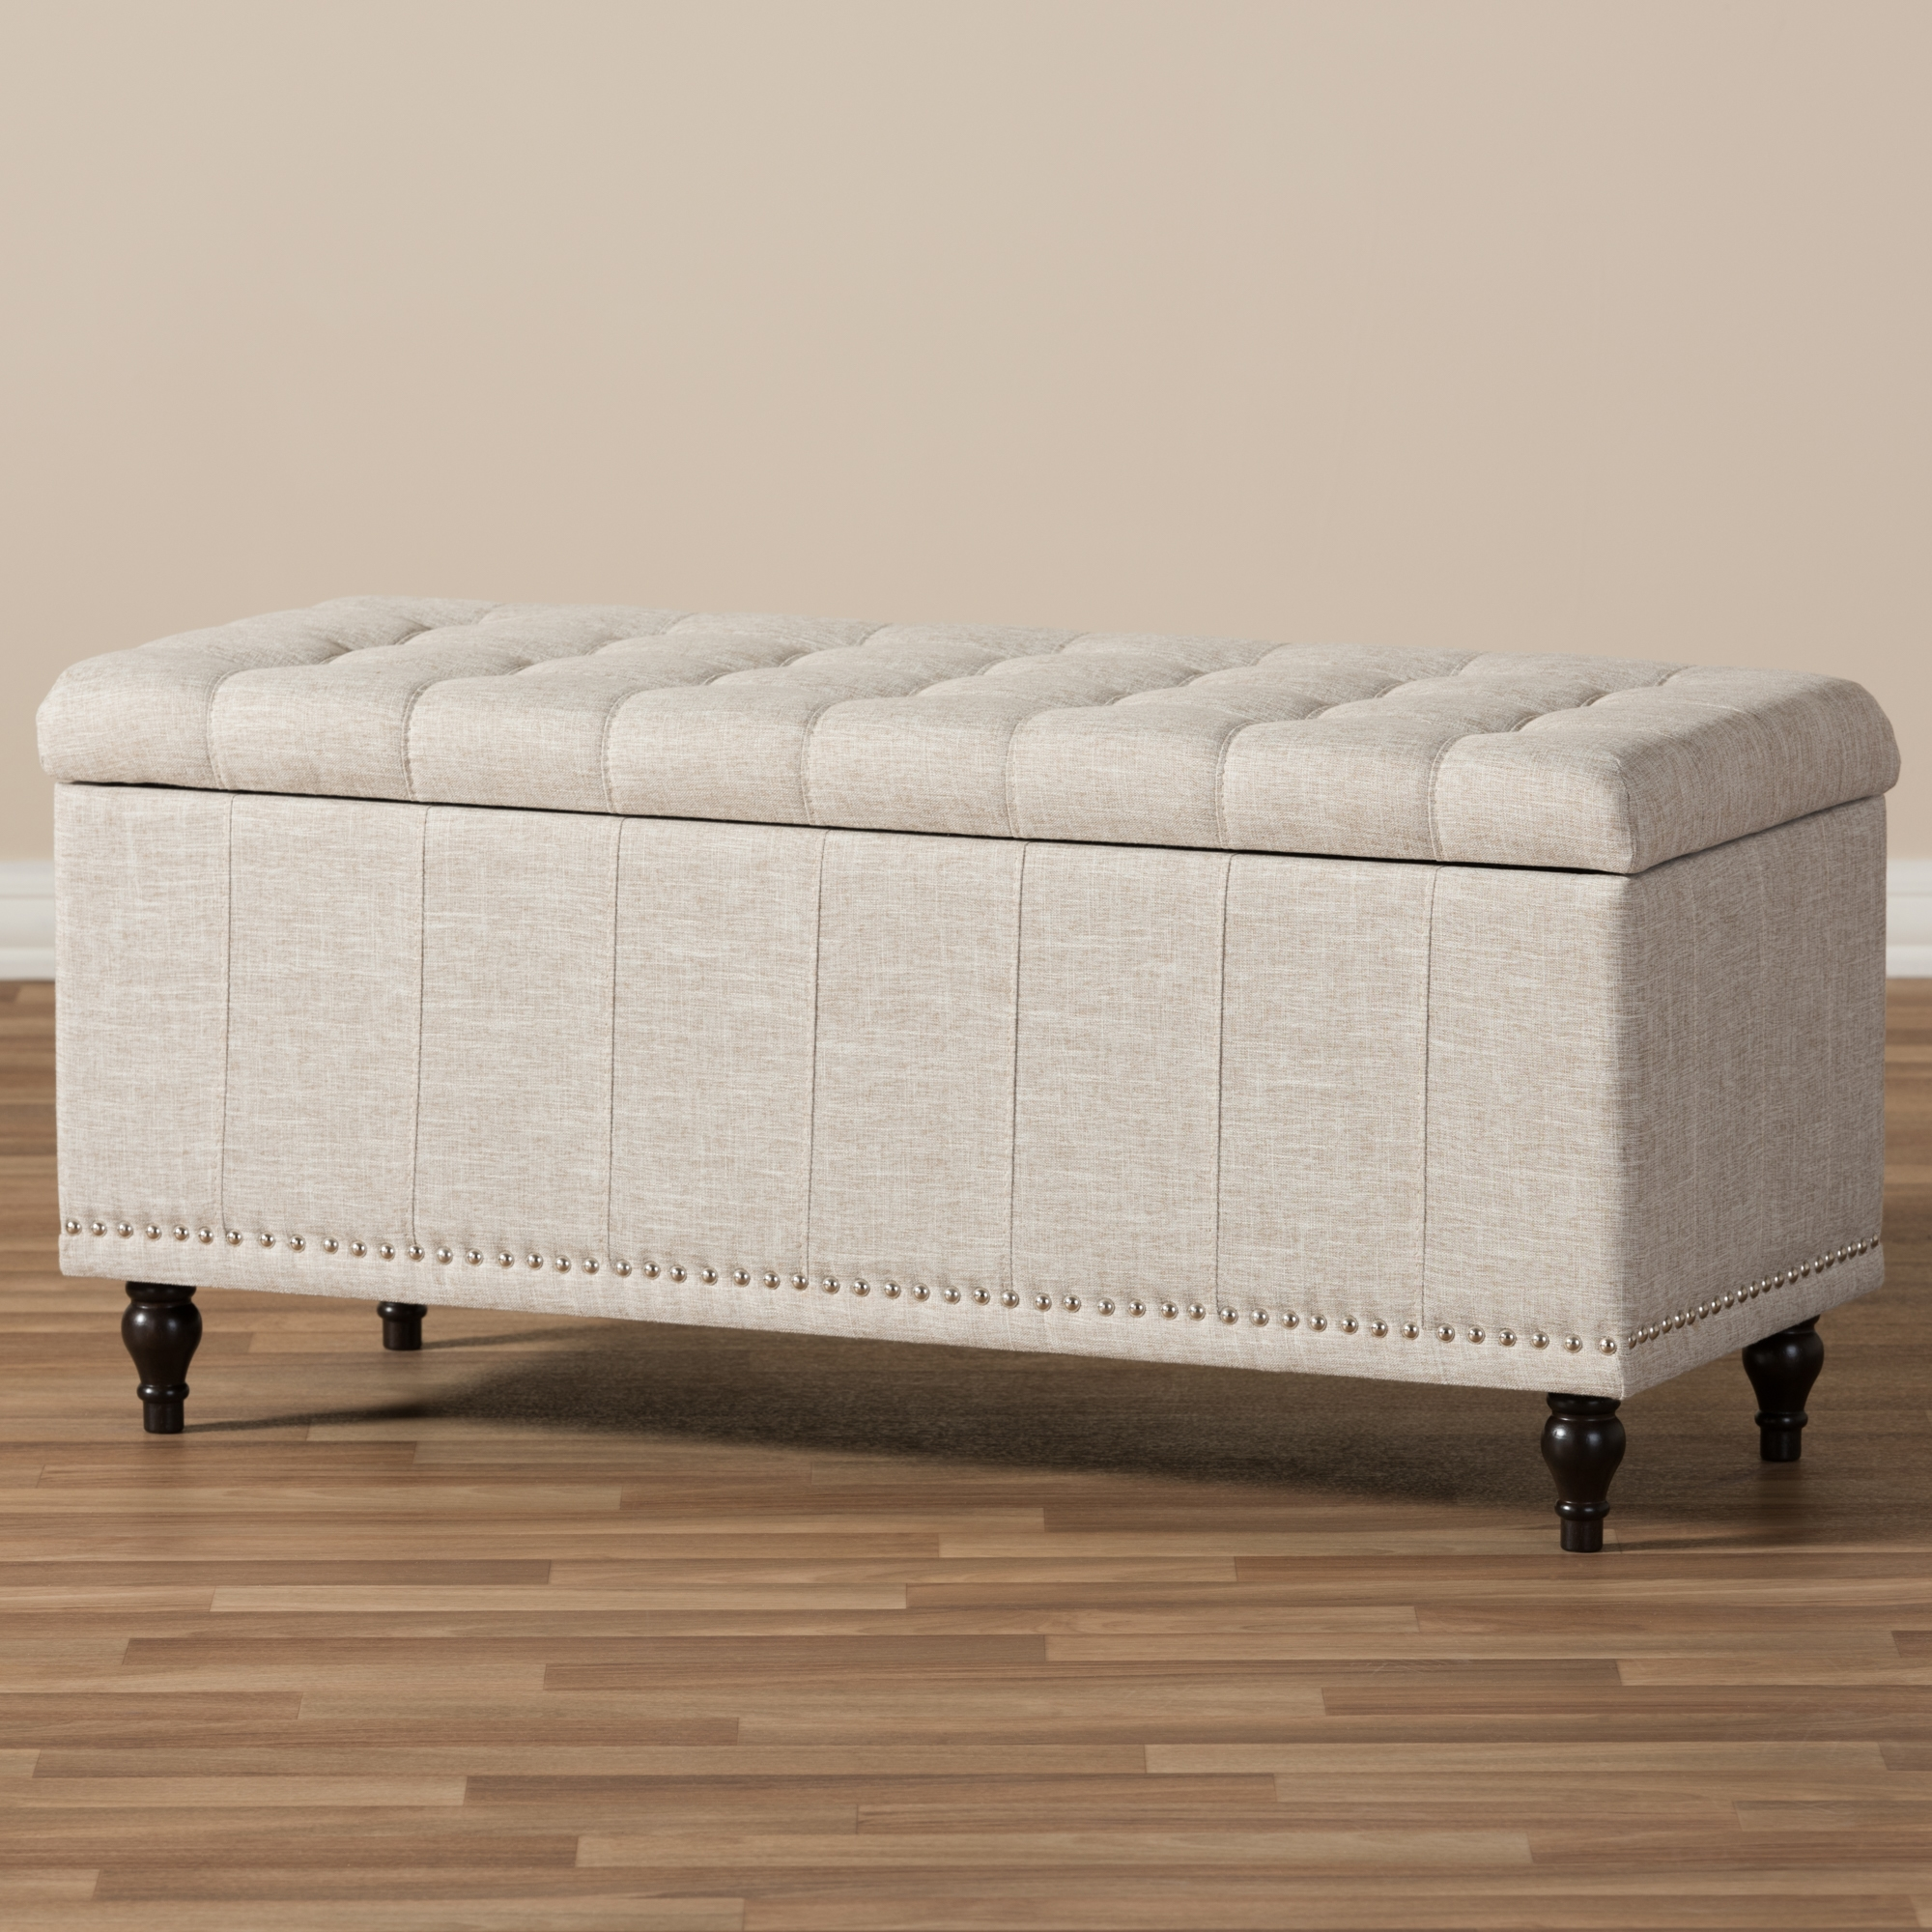 ... Baxton Studio Kaylee Modern Classic Beige Fabric Upholstered  Button Tufting Storage Ottoman Bench   BSOBBT3137